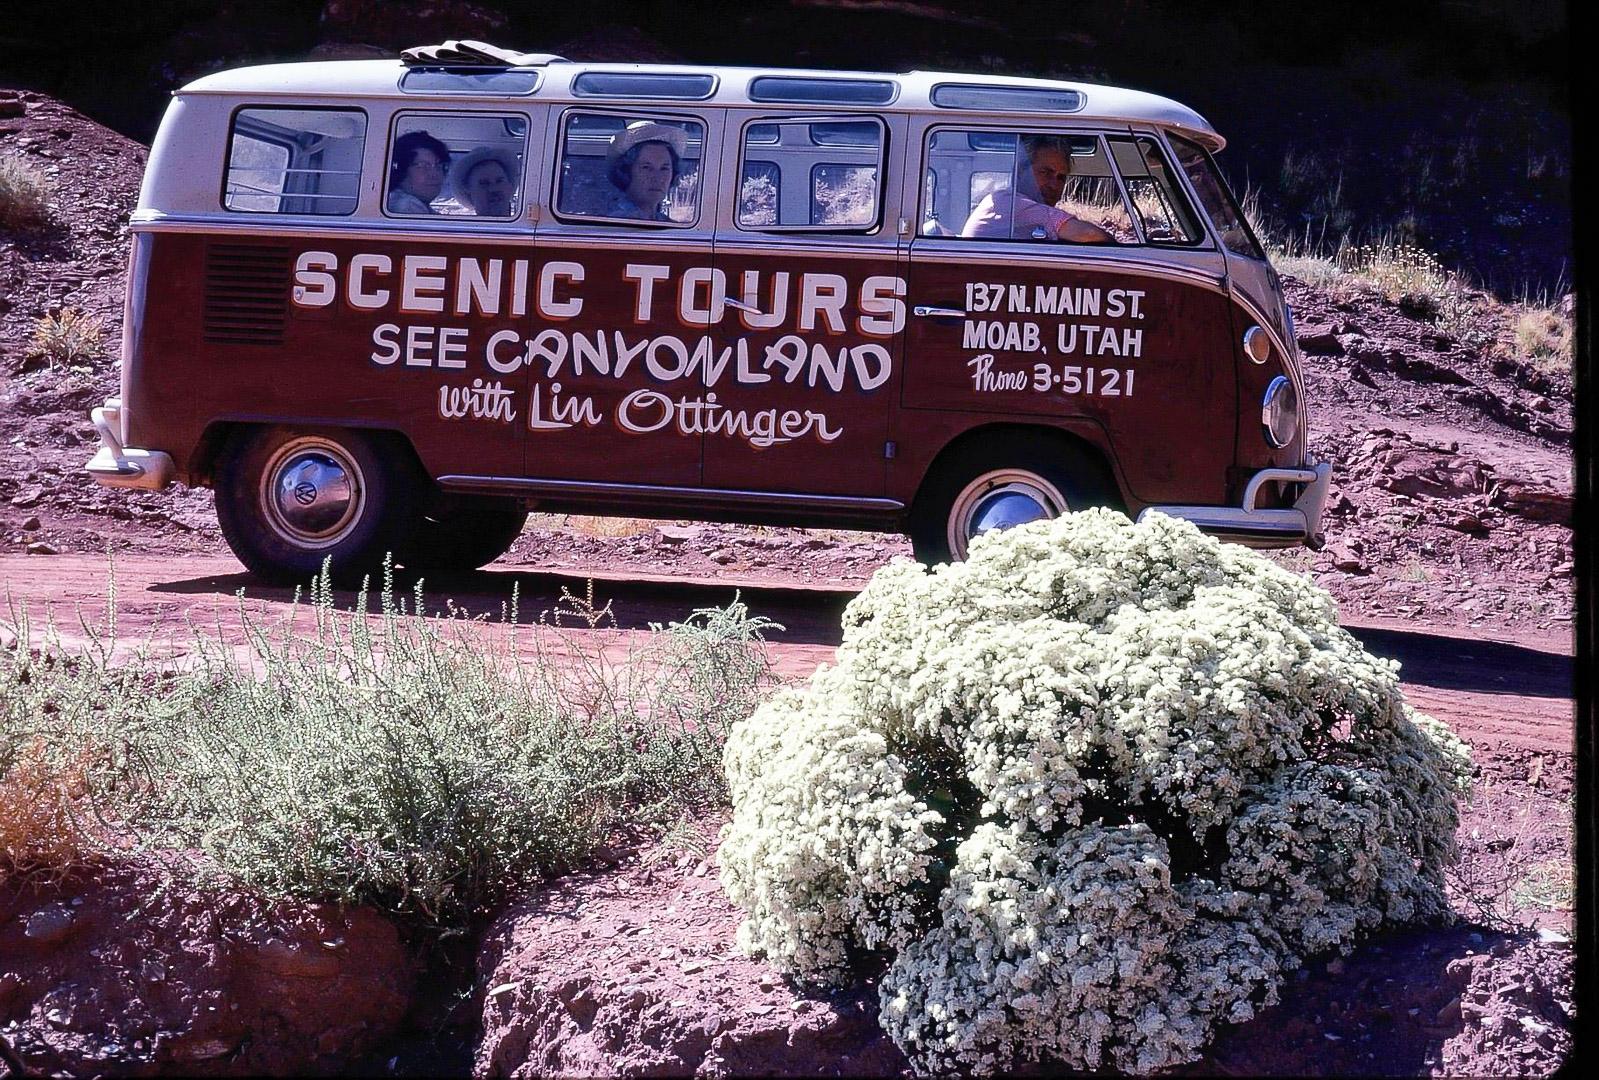 Lin Ottinger Canyon Land Scenic Tour VW Bus - BeCombi - Une-16